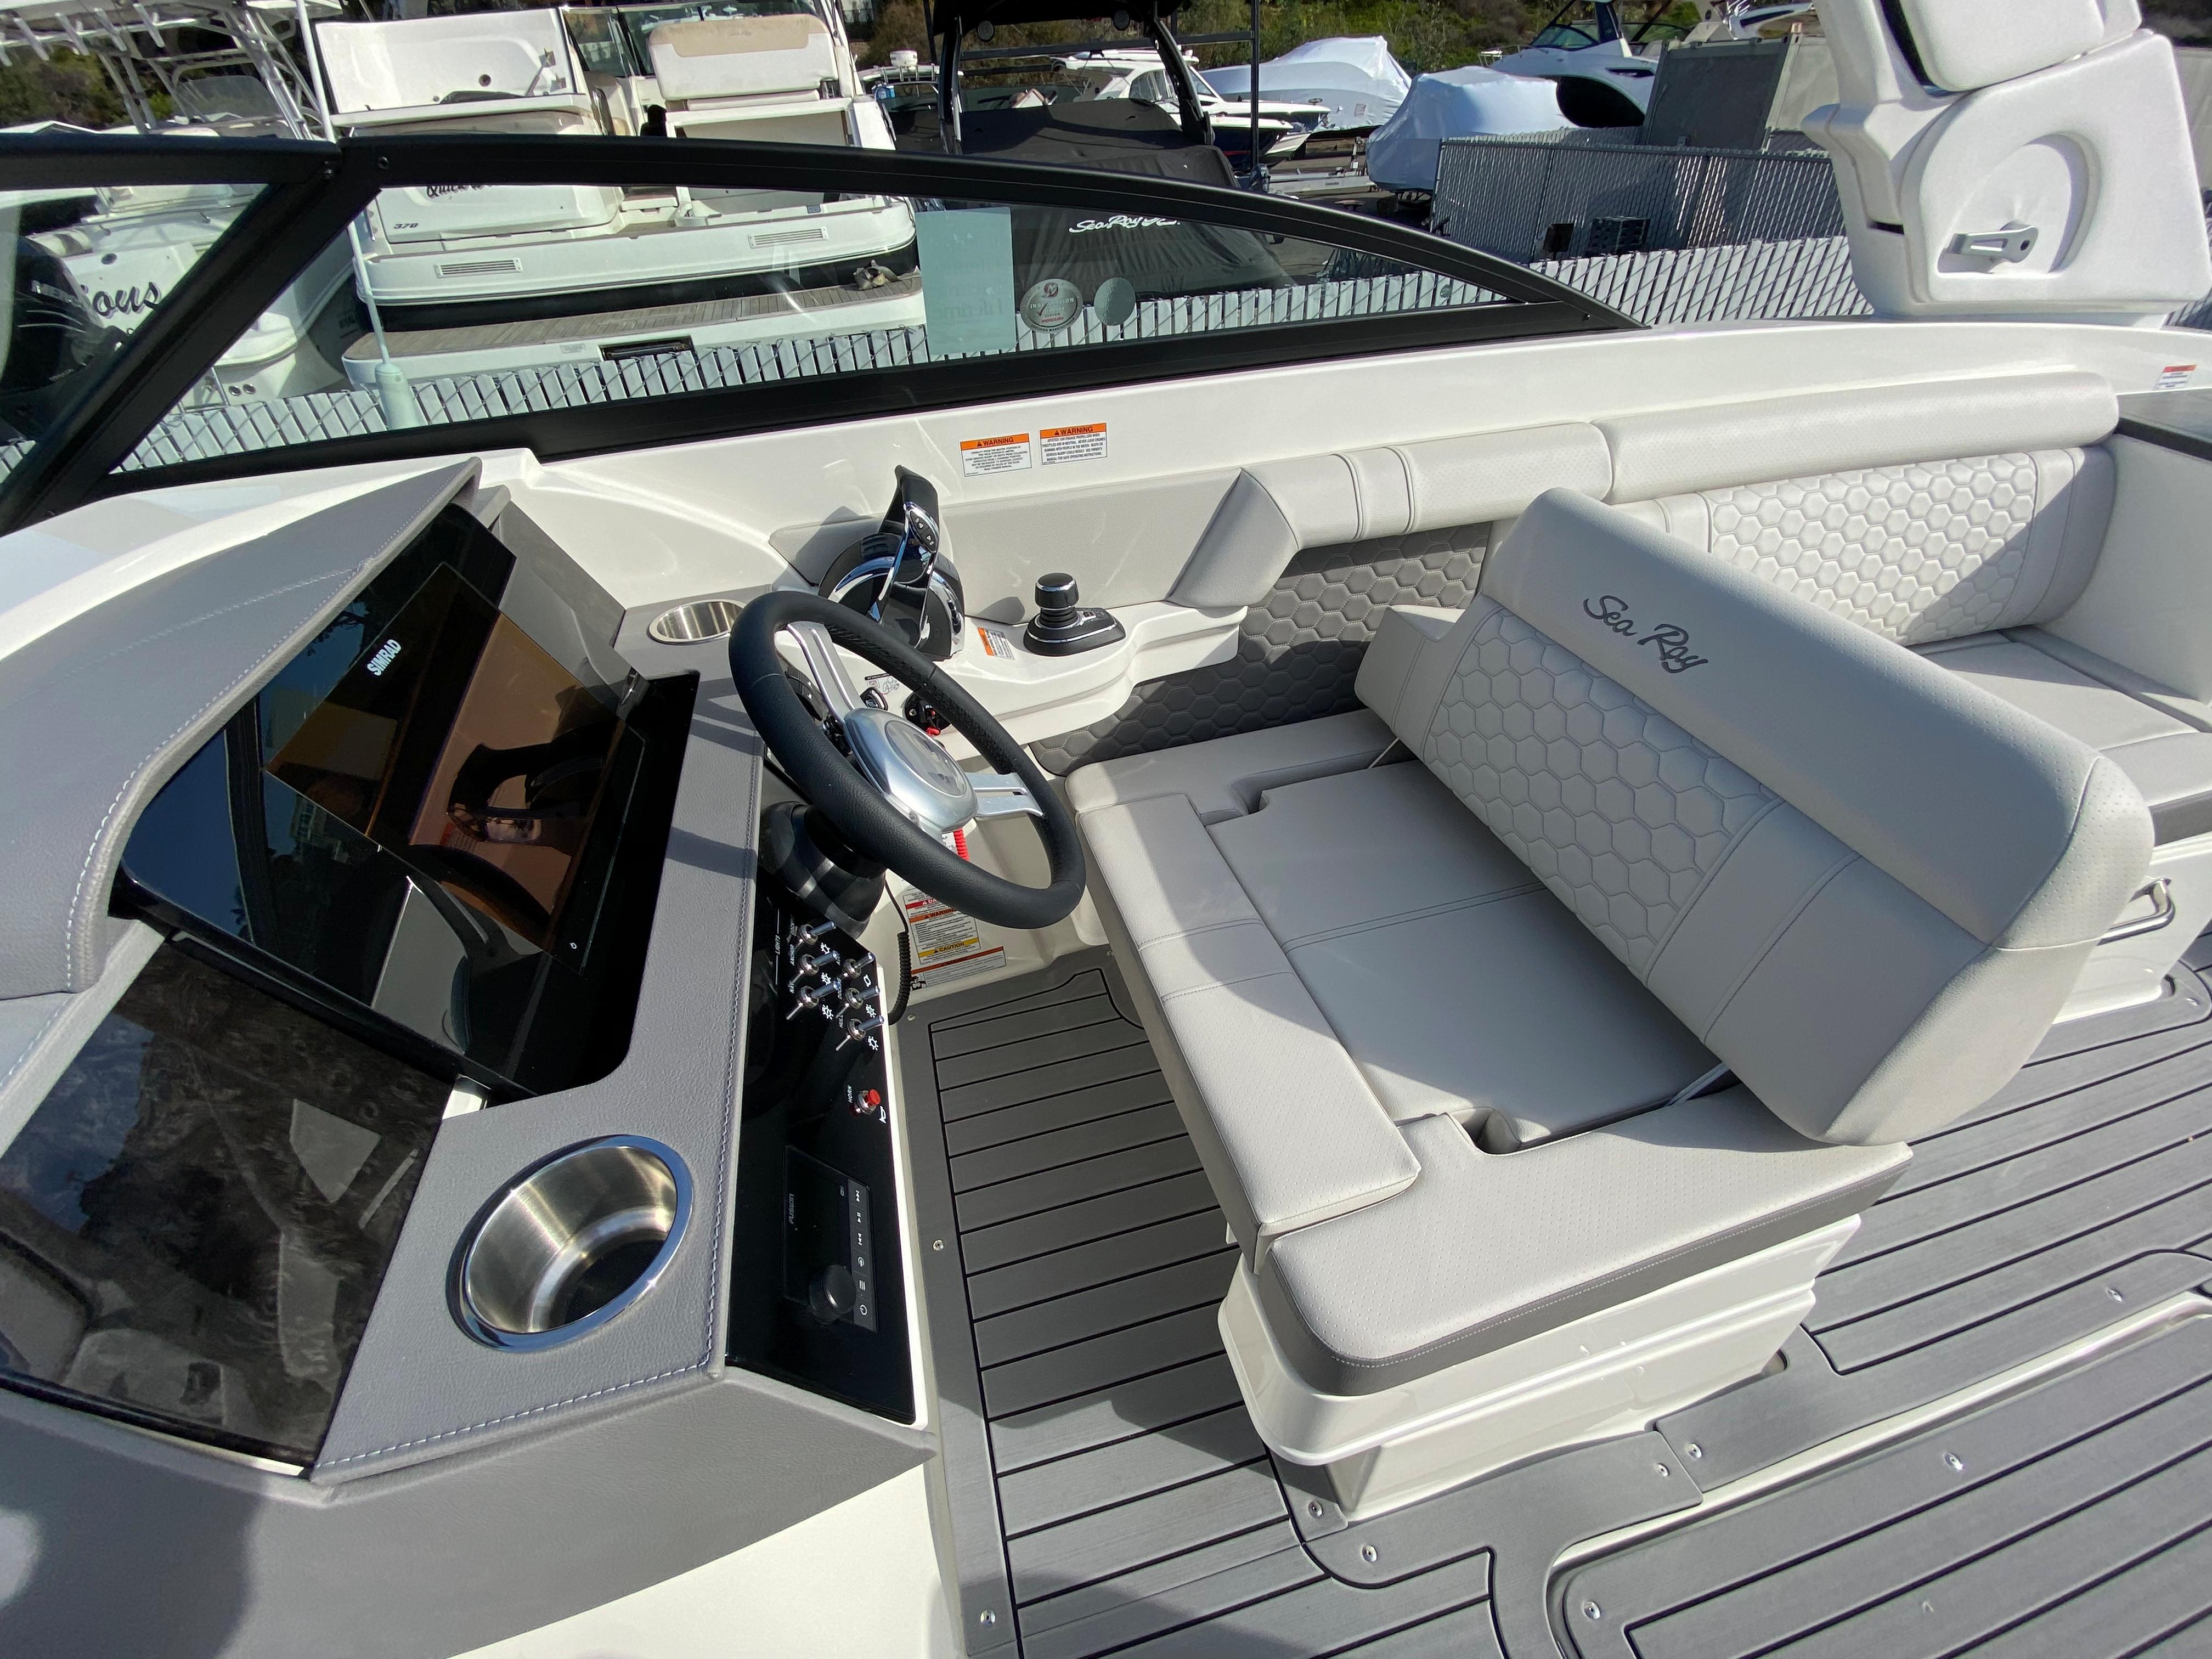 2021 Sea Ray SDX 290 OB #S1541J inventory image at Sun Country Coastal in Newport Beach